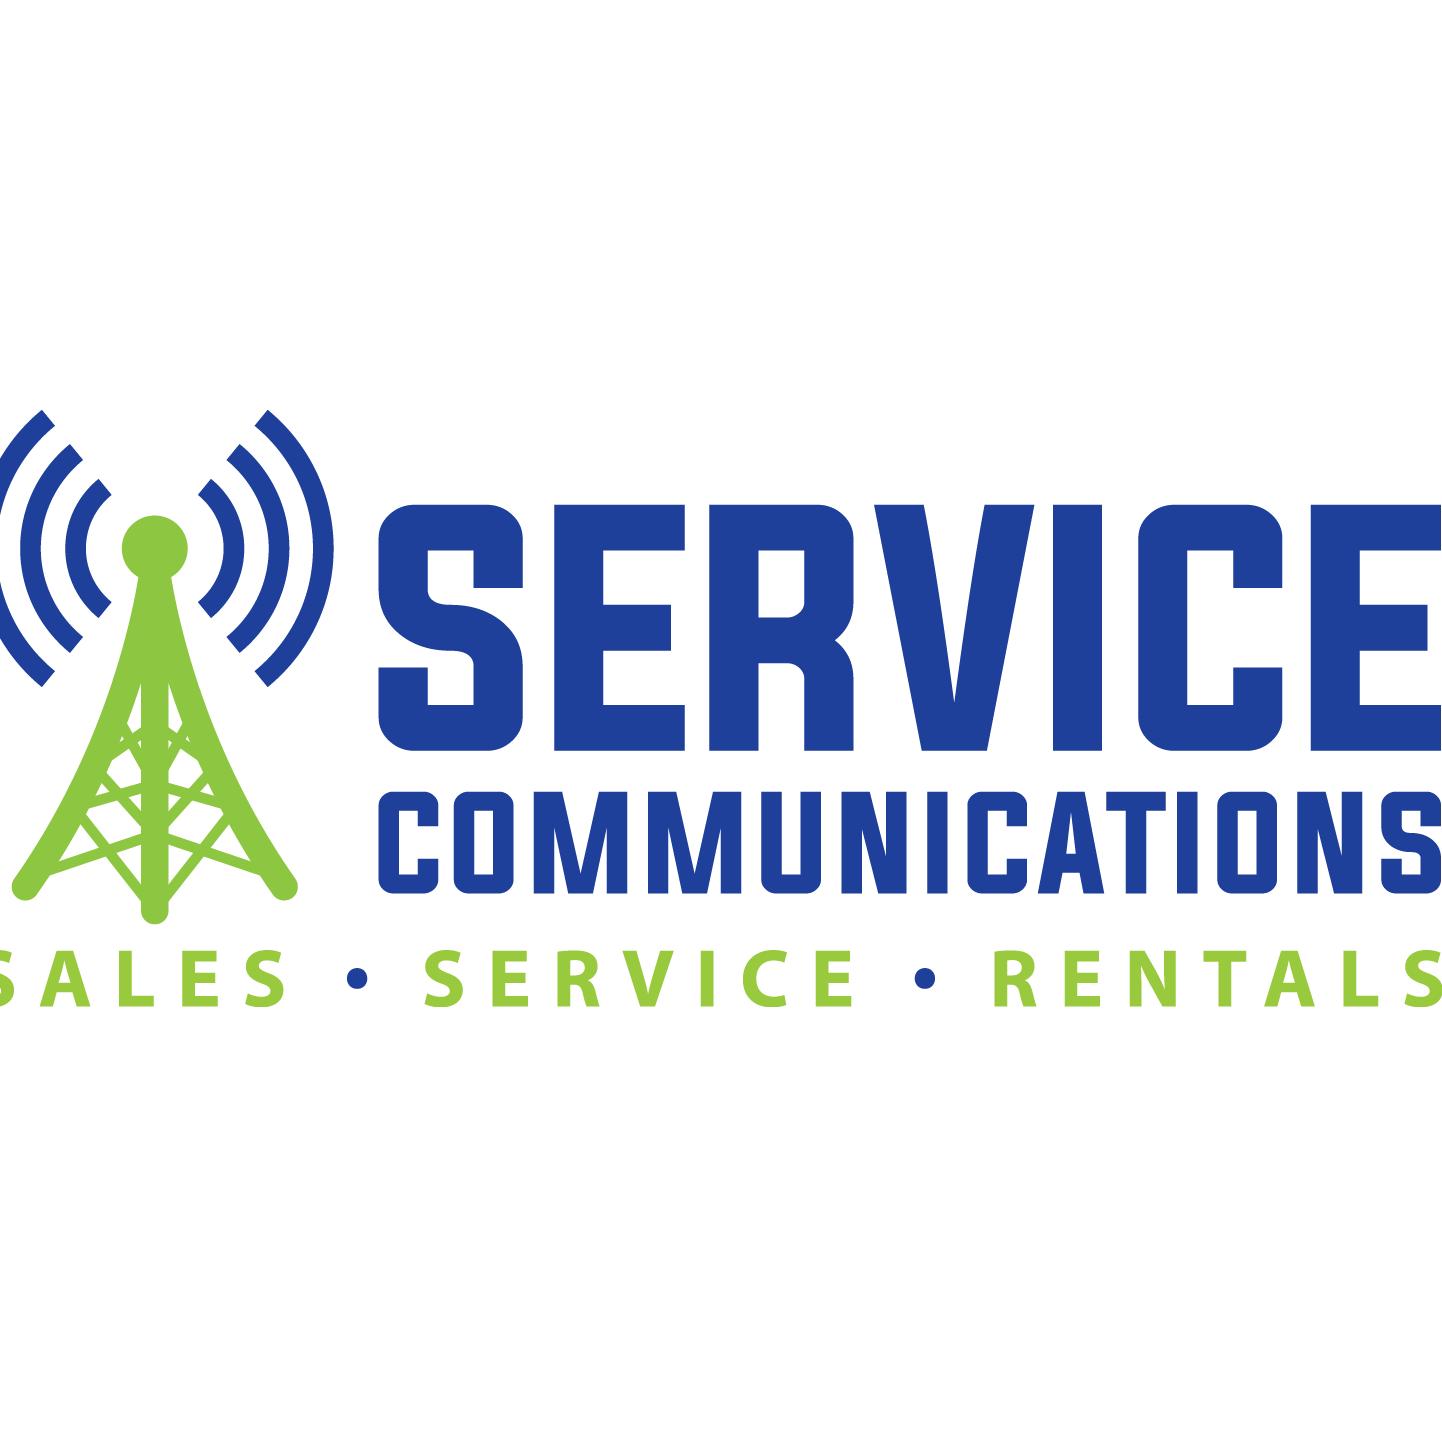 Service Communications of Acadiana, Inc image 2